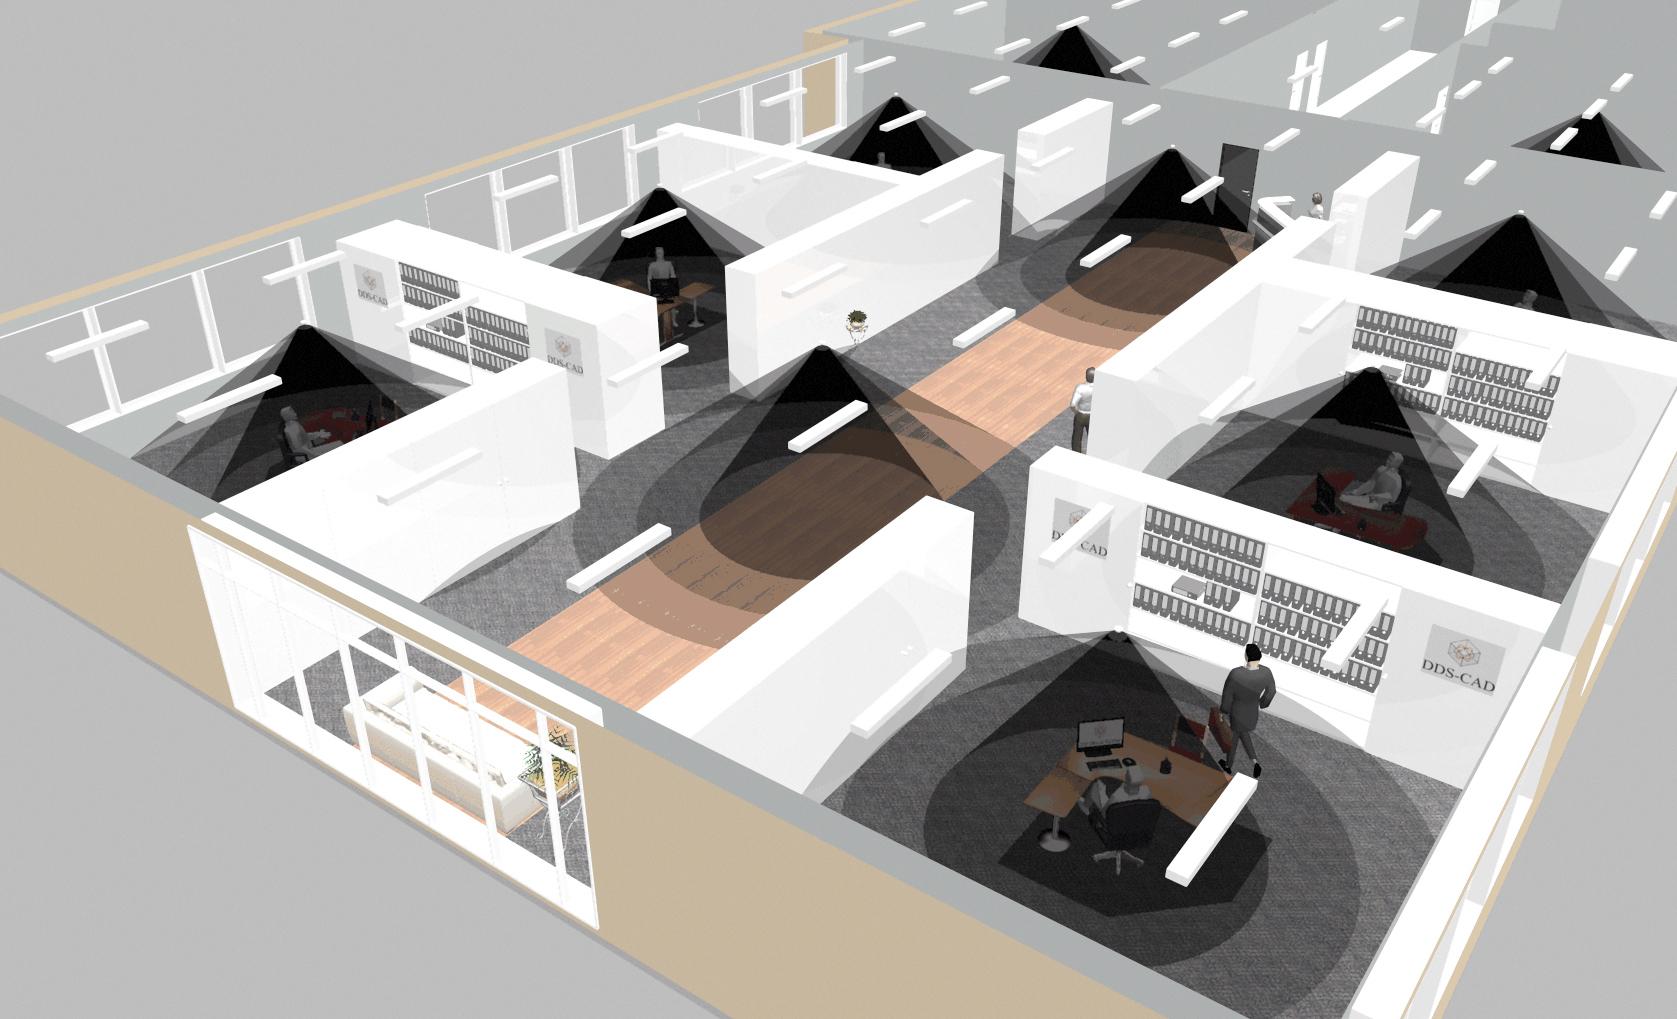 neue planungsl sung von data design system geb udedigital. Black Bedroom Furniture Sets. Home Design Ideas